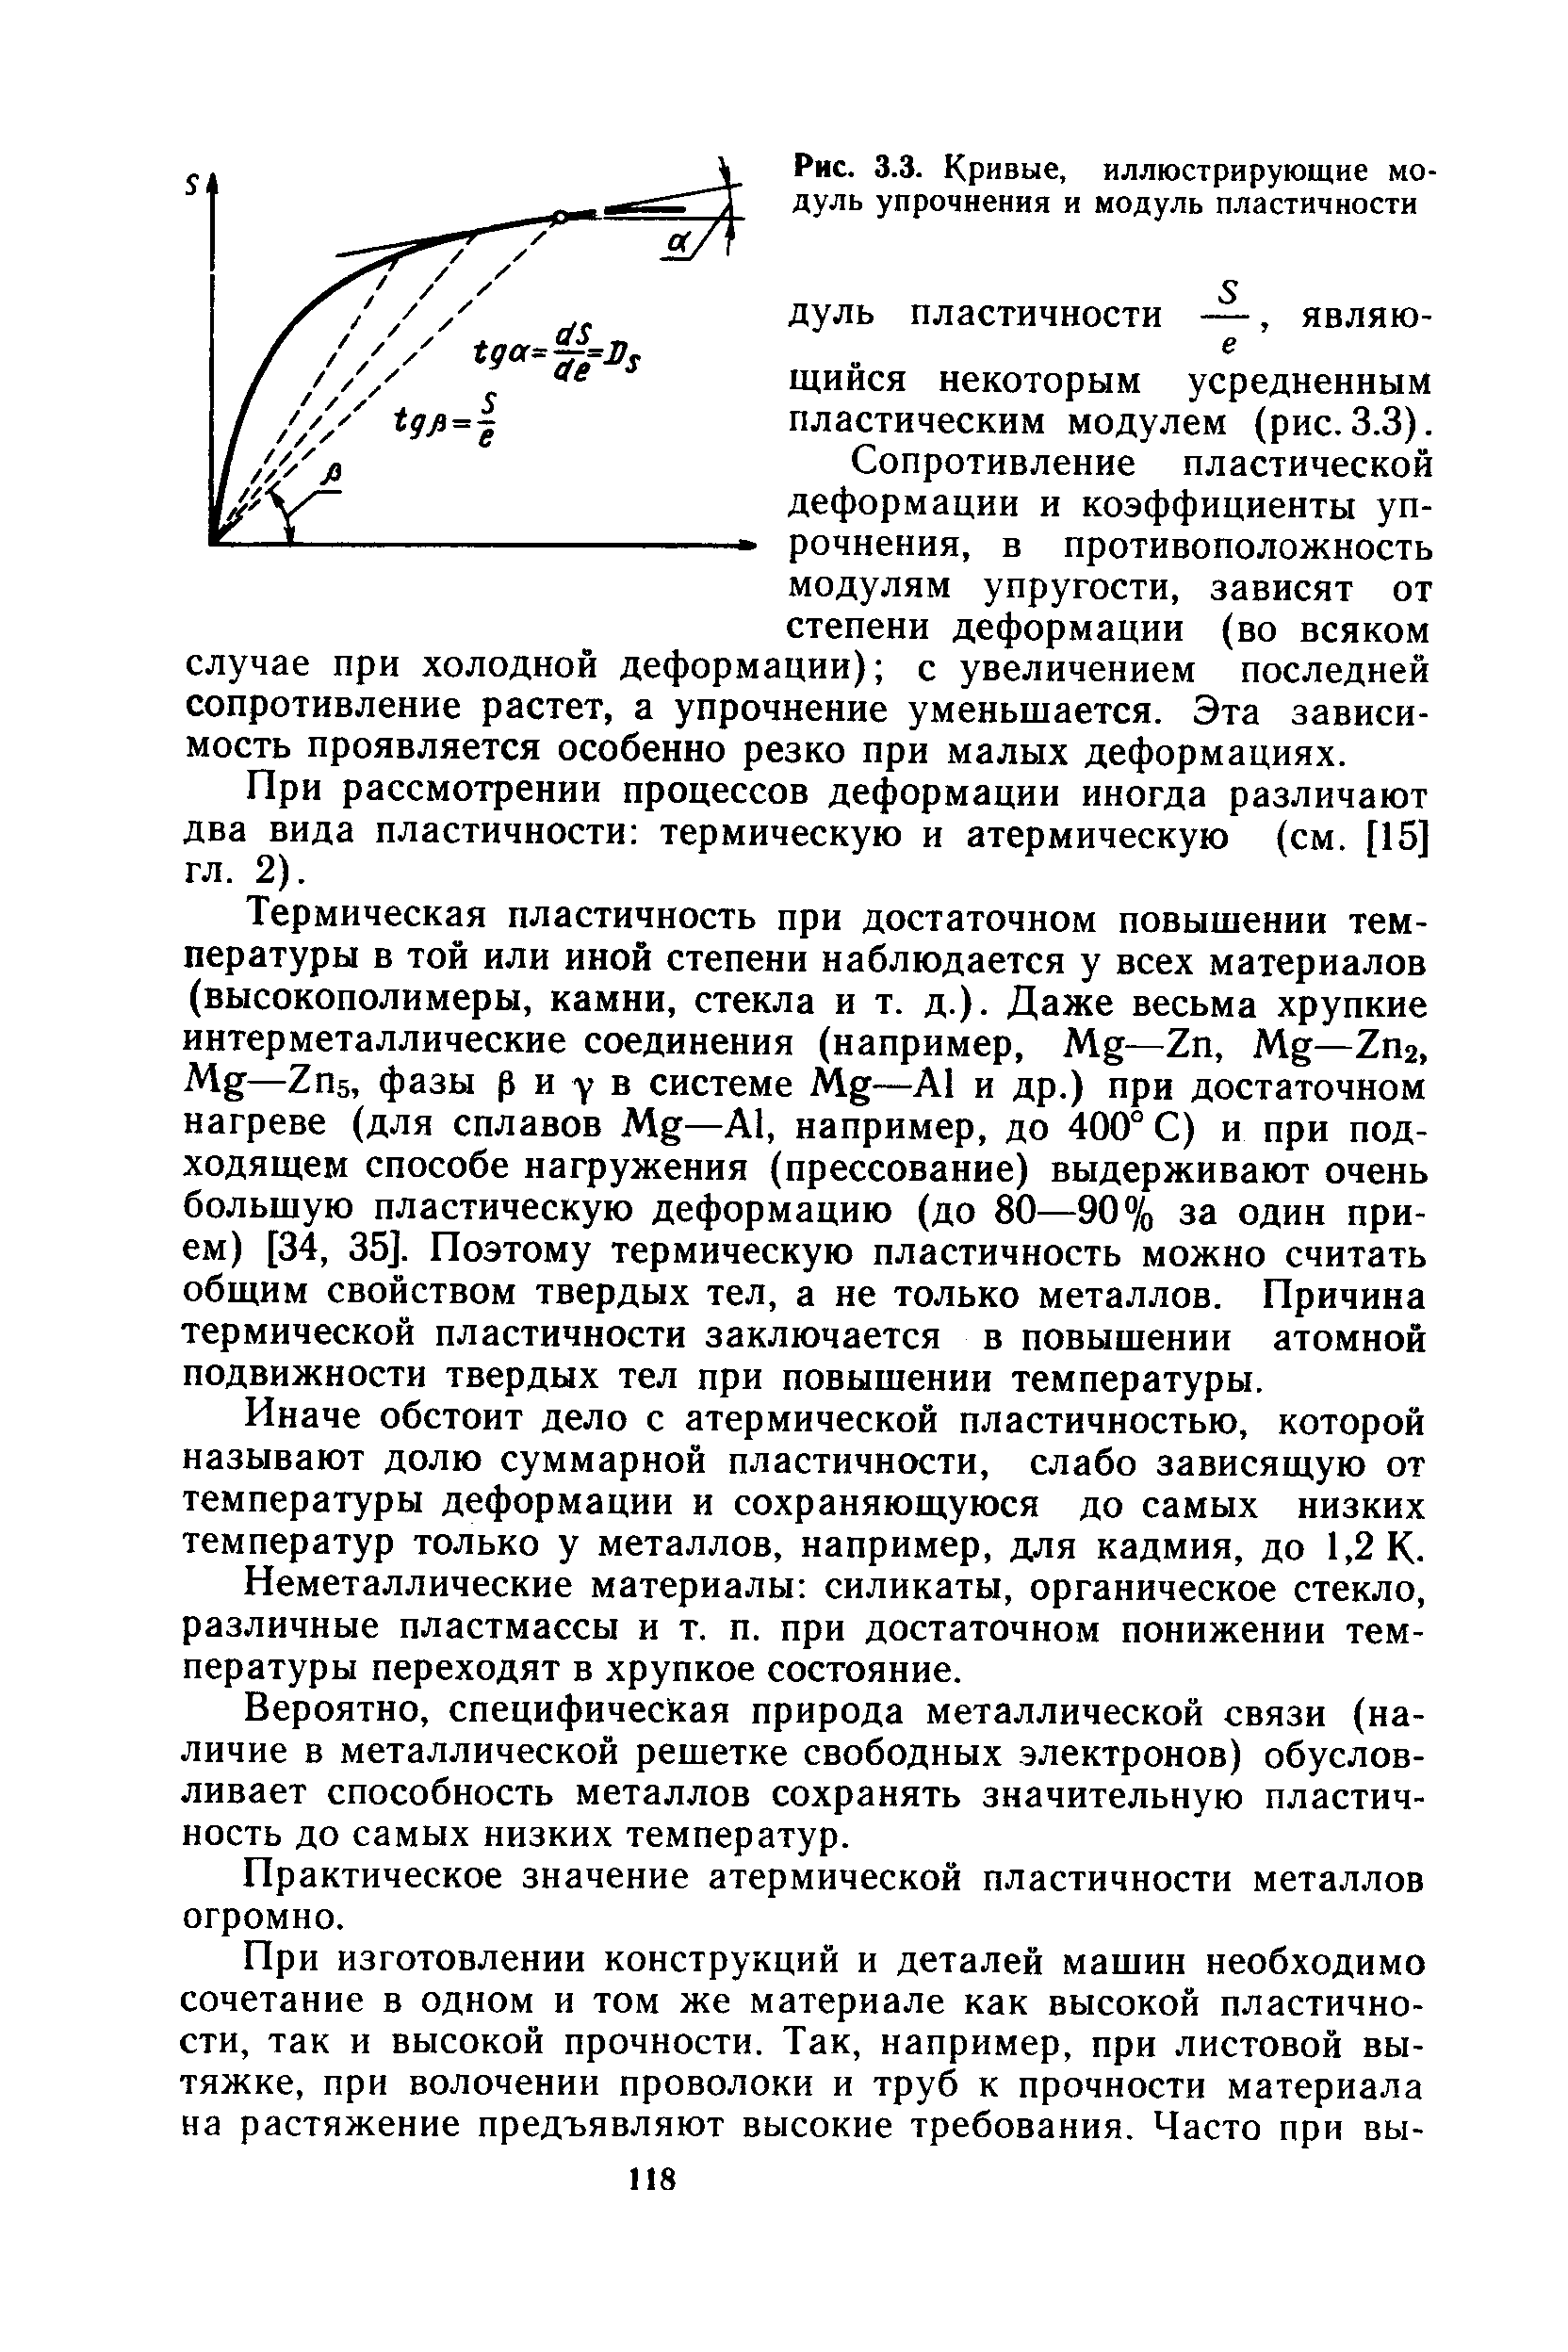 Пластичность (физика) - plasticity (physics)